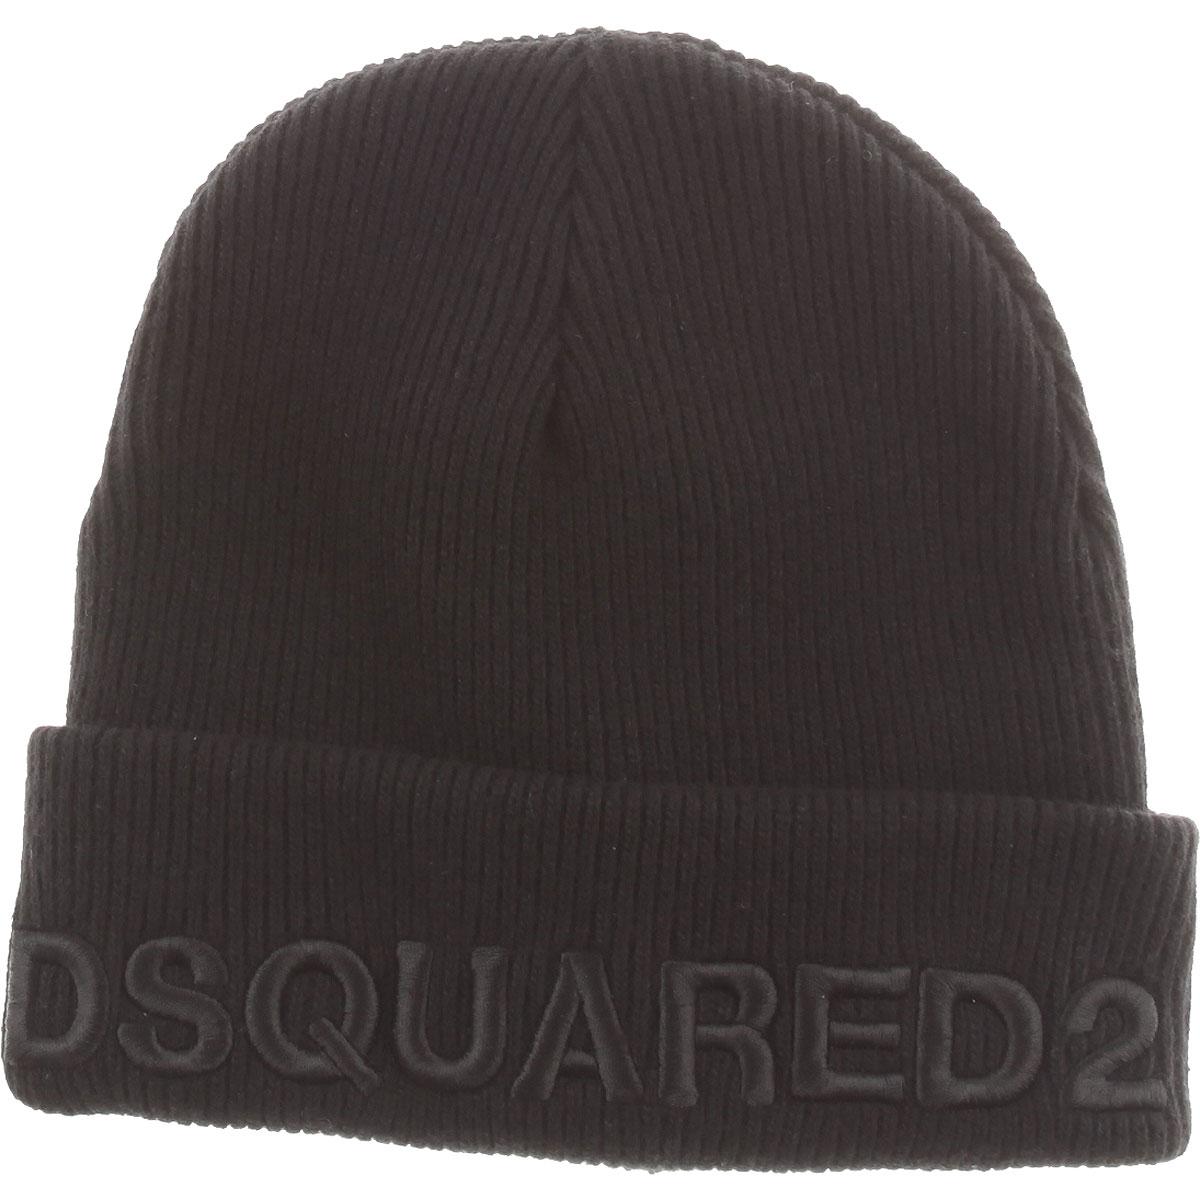 Image of Dsquared2 Kids Hats for Boys, Black, Wool, 2017, I II III